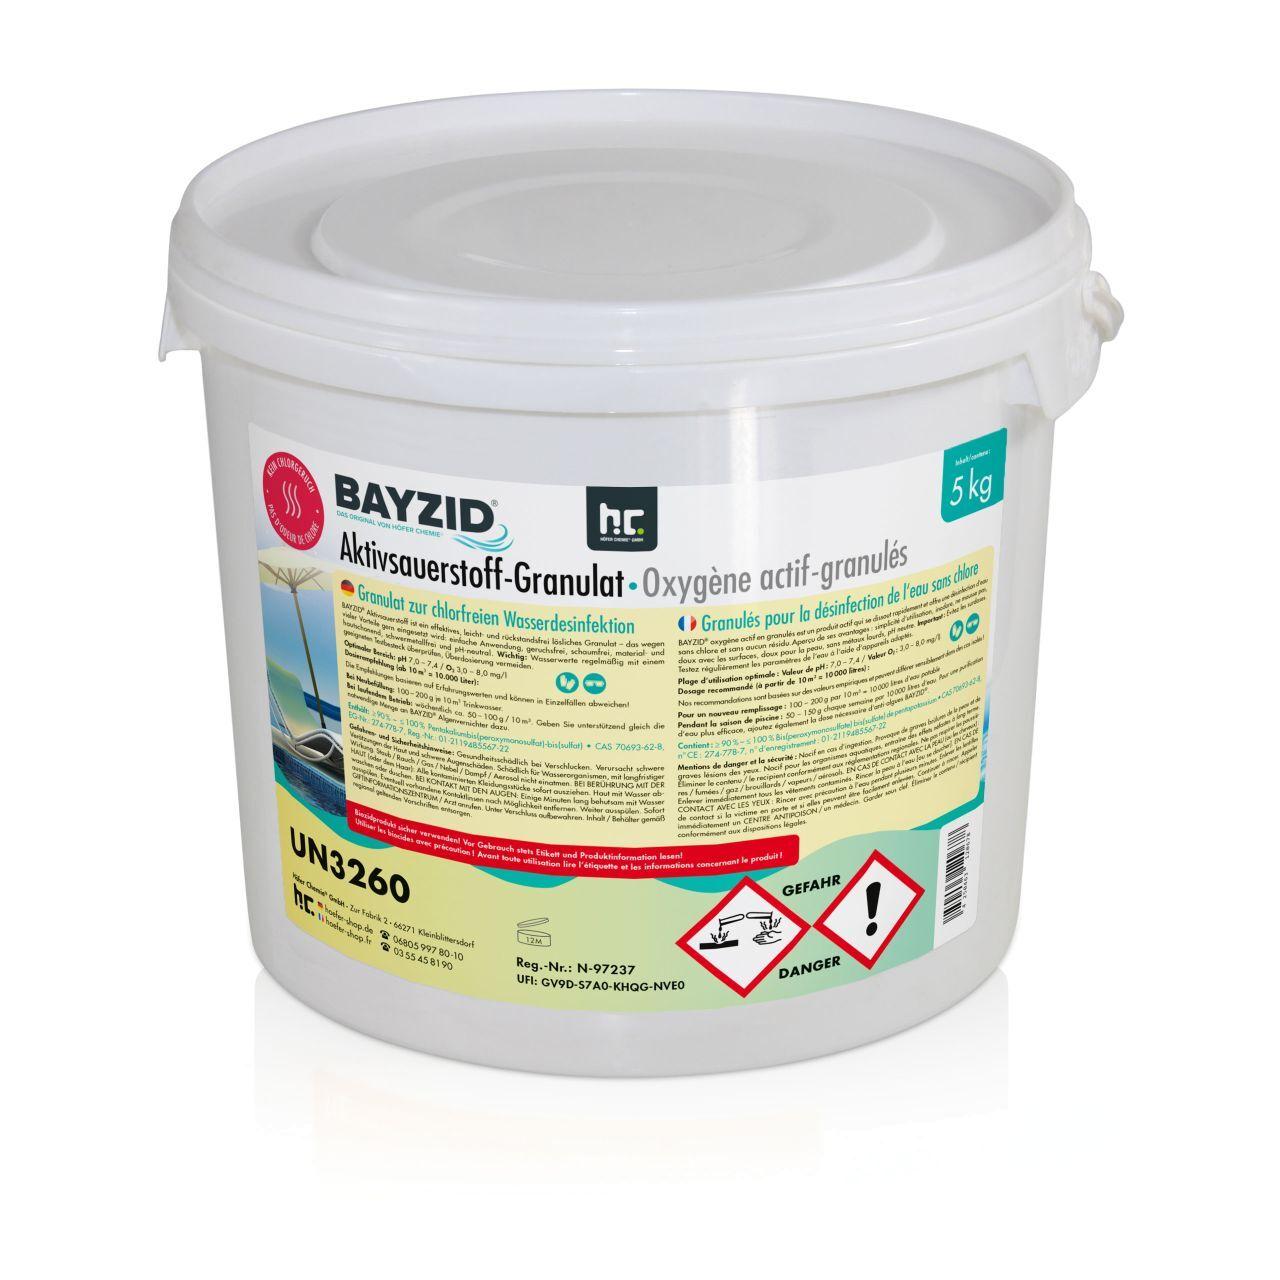 Höfer Chemie 20 kg BAYZID® Oxygène actif – granulés (4 x 5 kg)